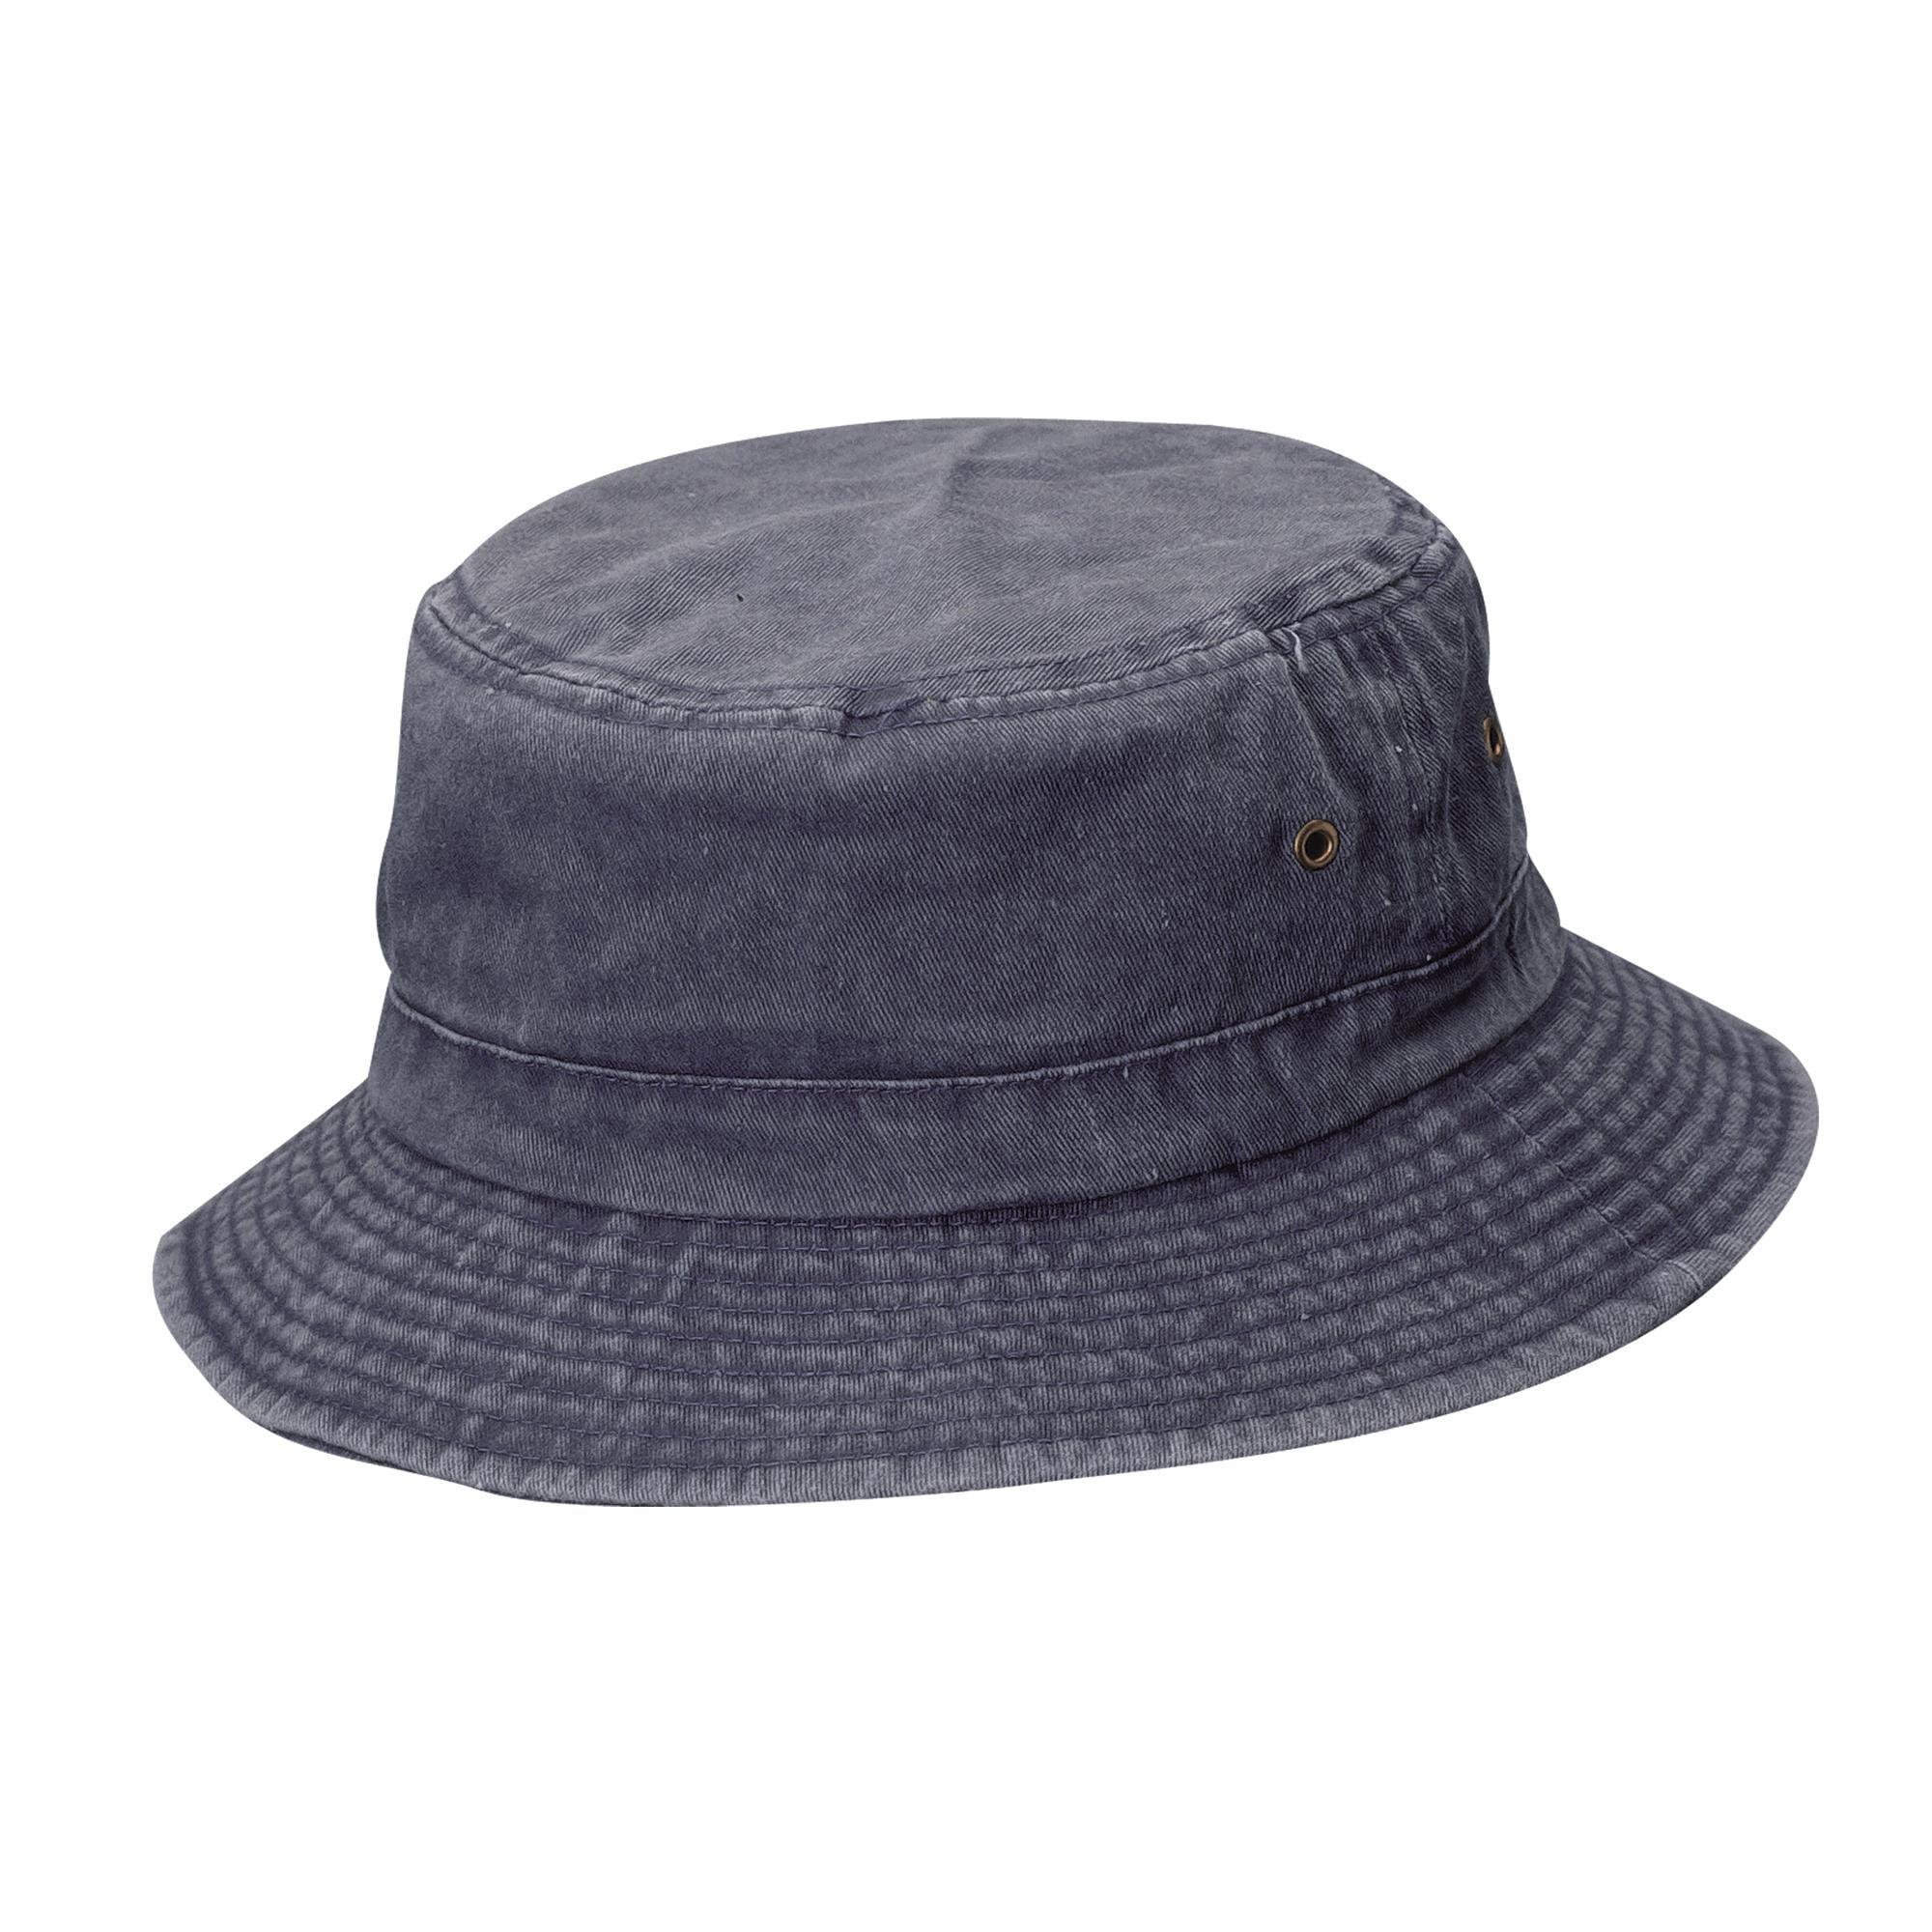 fd8be20020b Dorfman Pacific Cotton Big and Tall Summer Bucket Hat 2XL 3XL